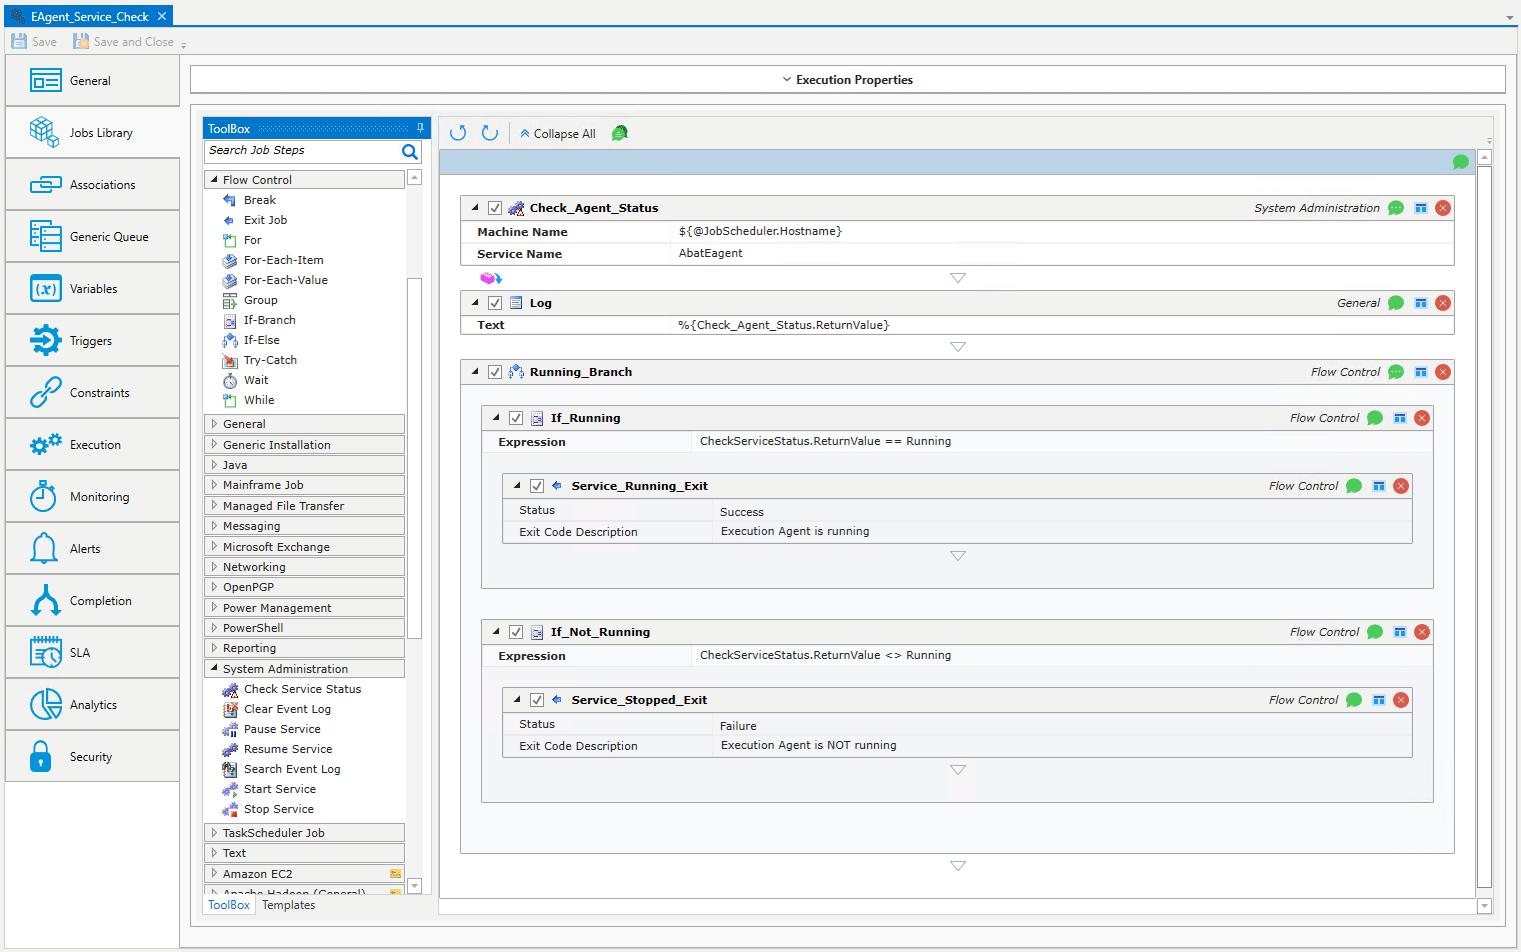 ActiveBatch Workload Automation